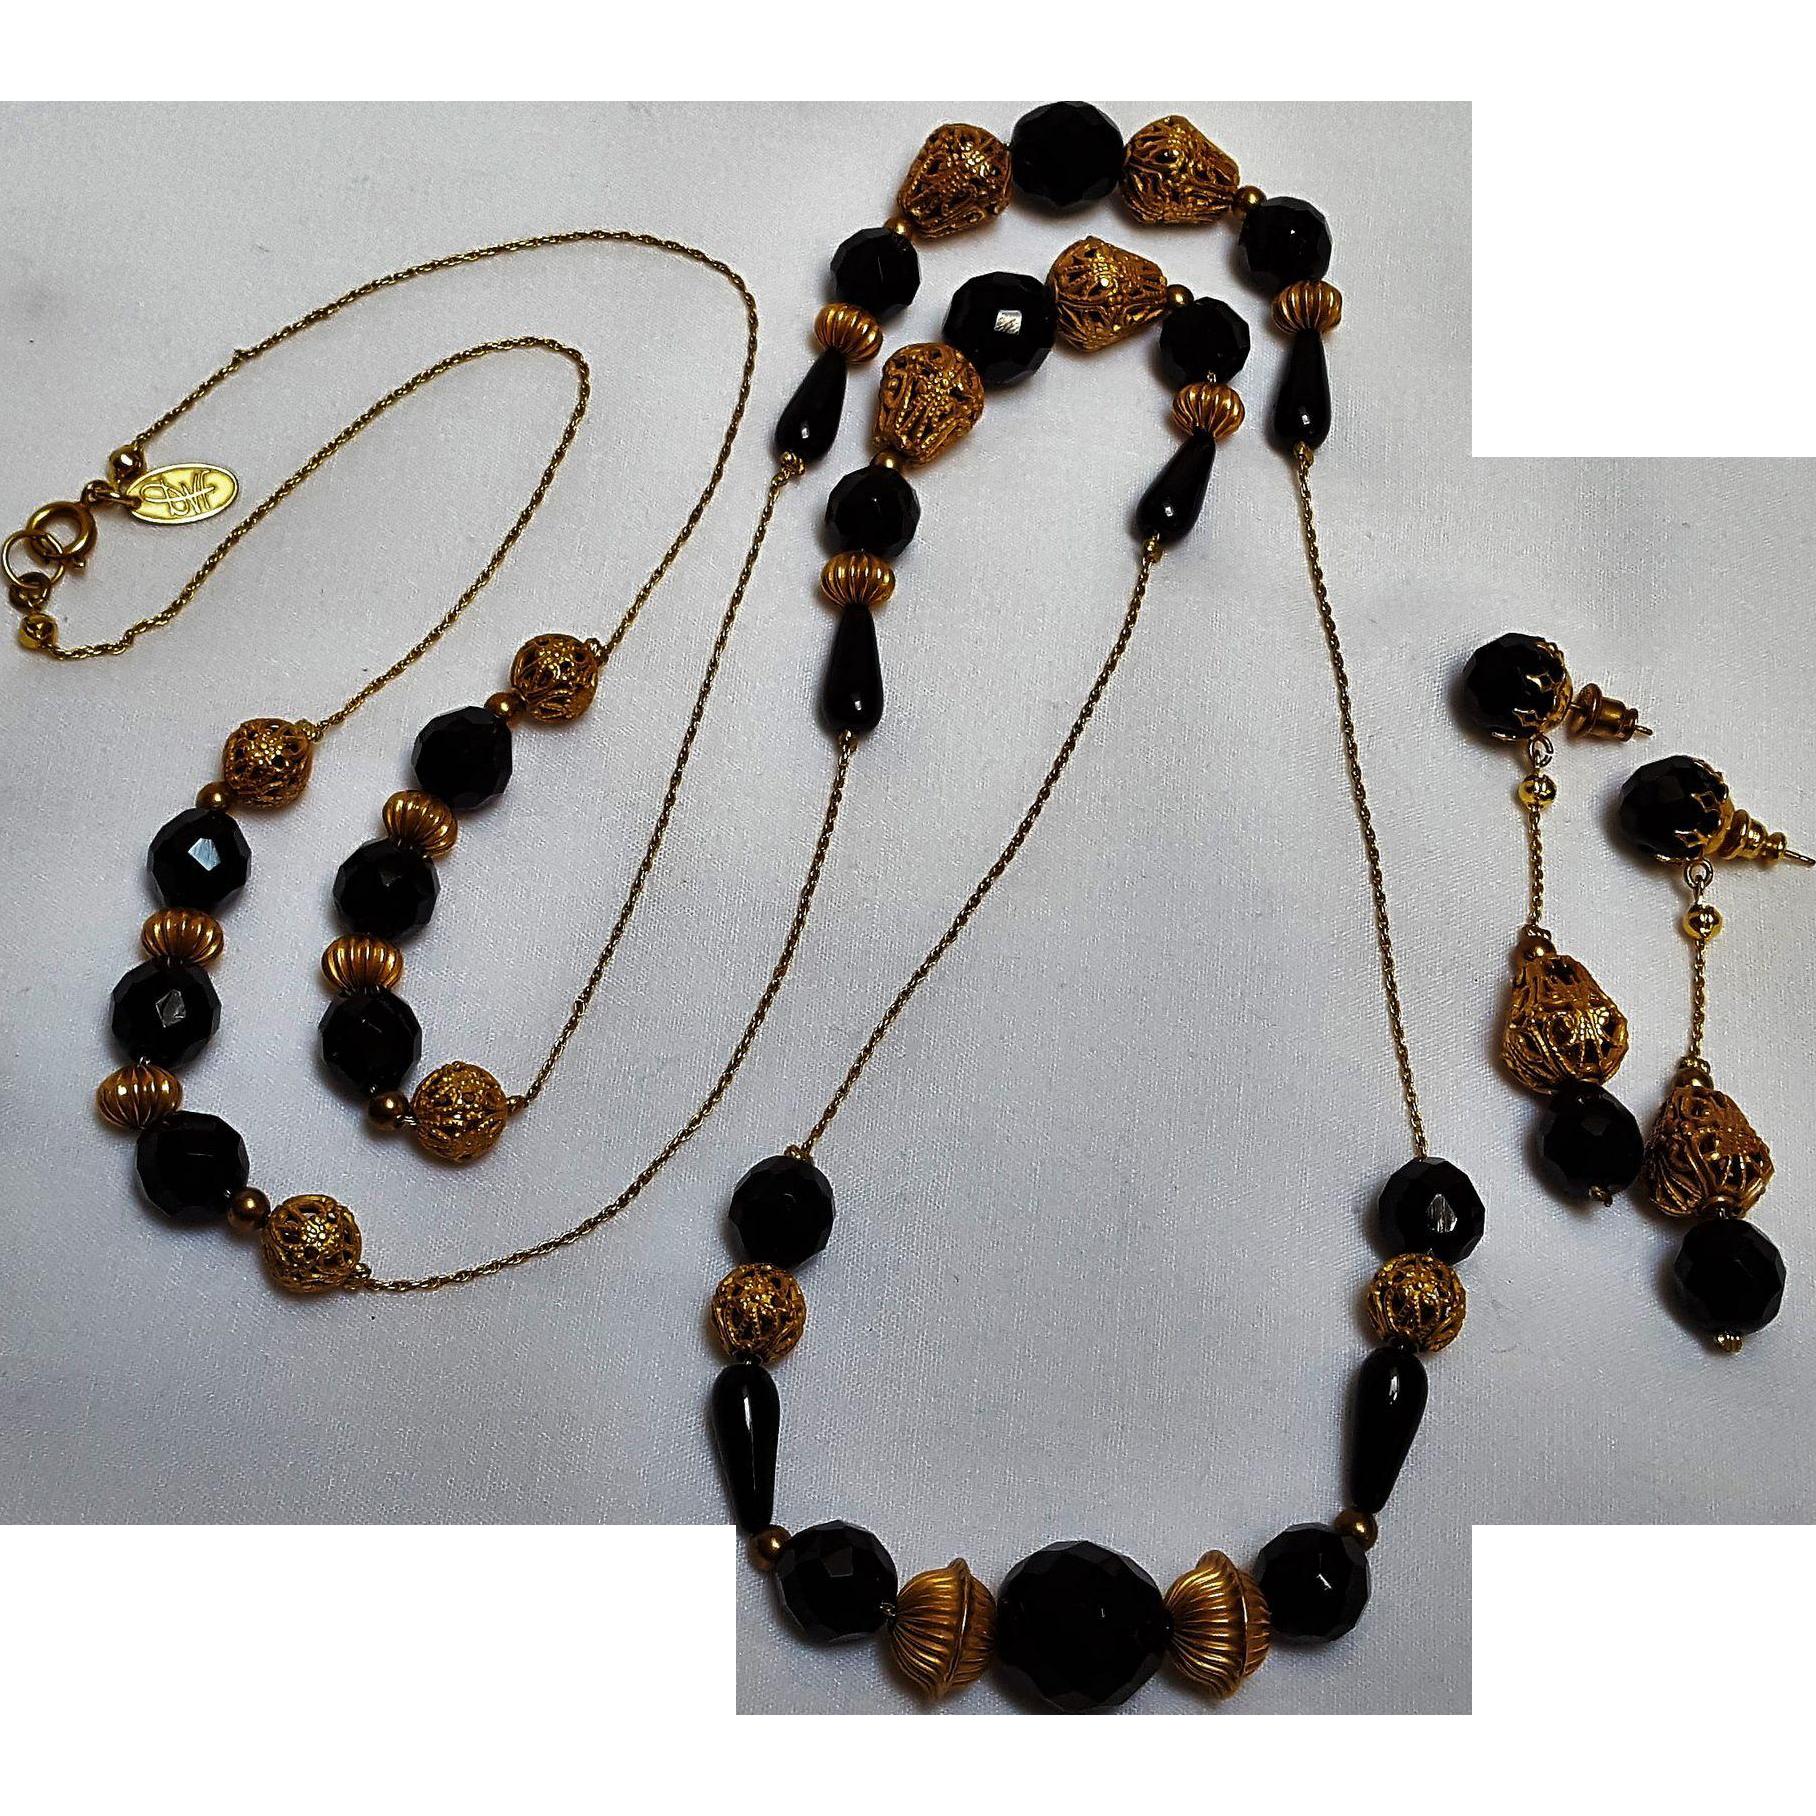 Diane Von Furstenberg necklace earrings set  black glass filigree beads